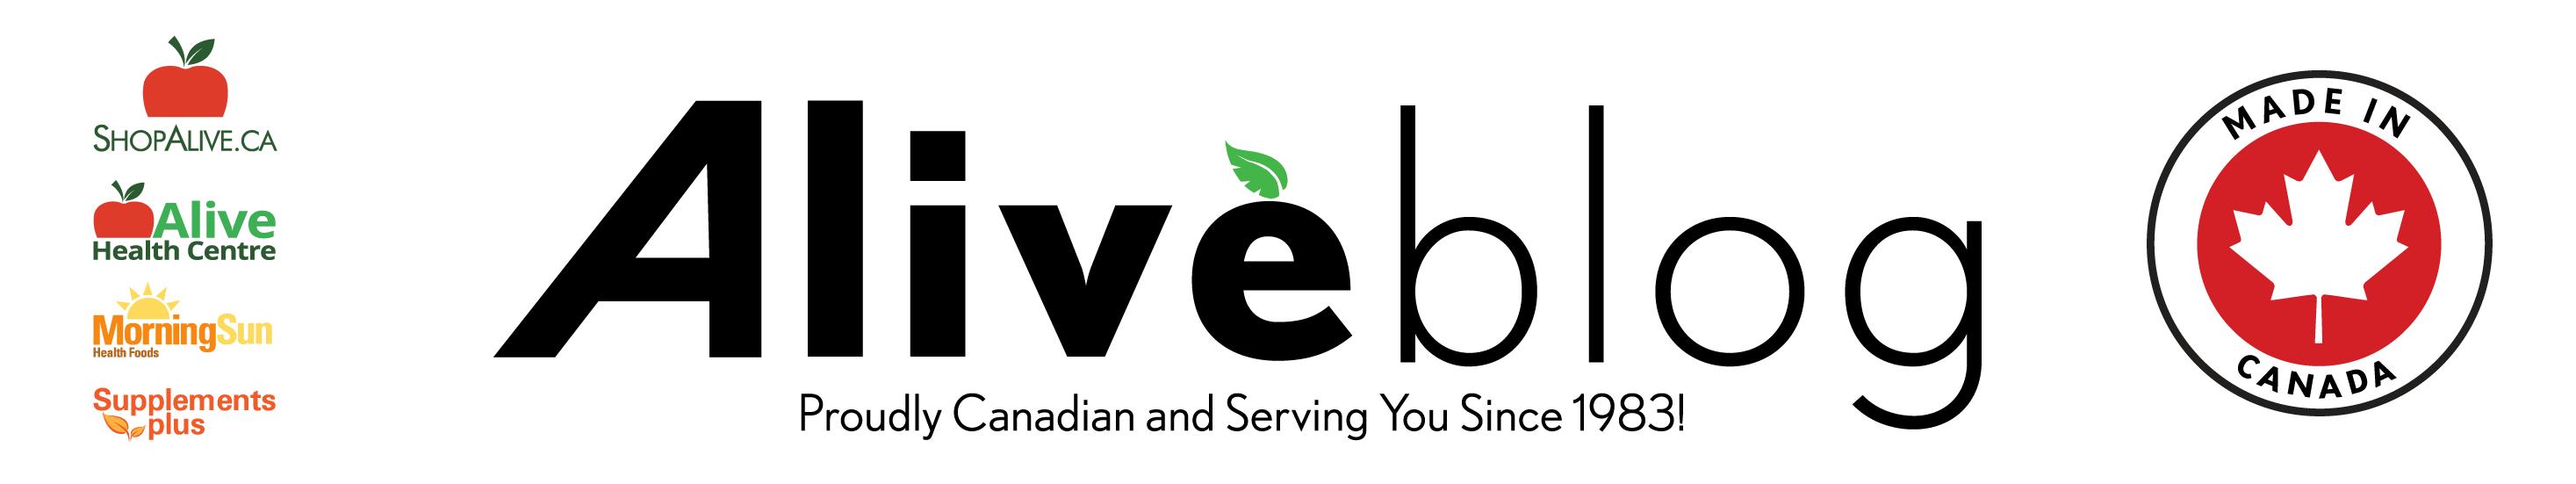 Alive Blog Logo Alive Health Centre Morning Sun Supplements Plus